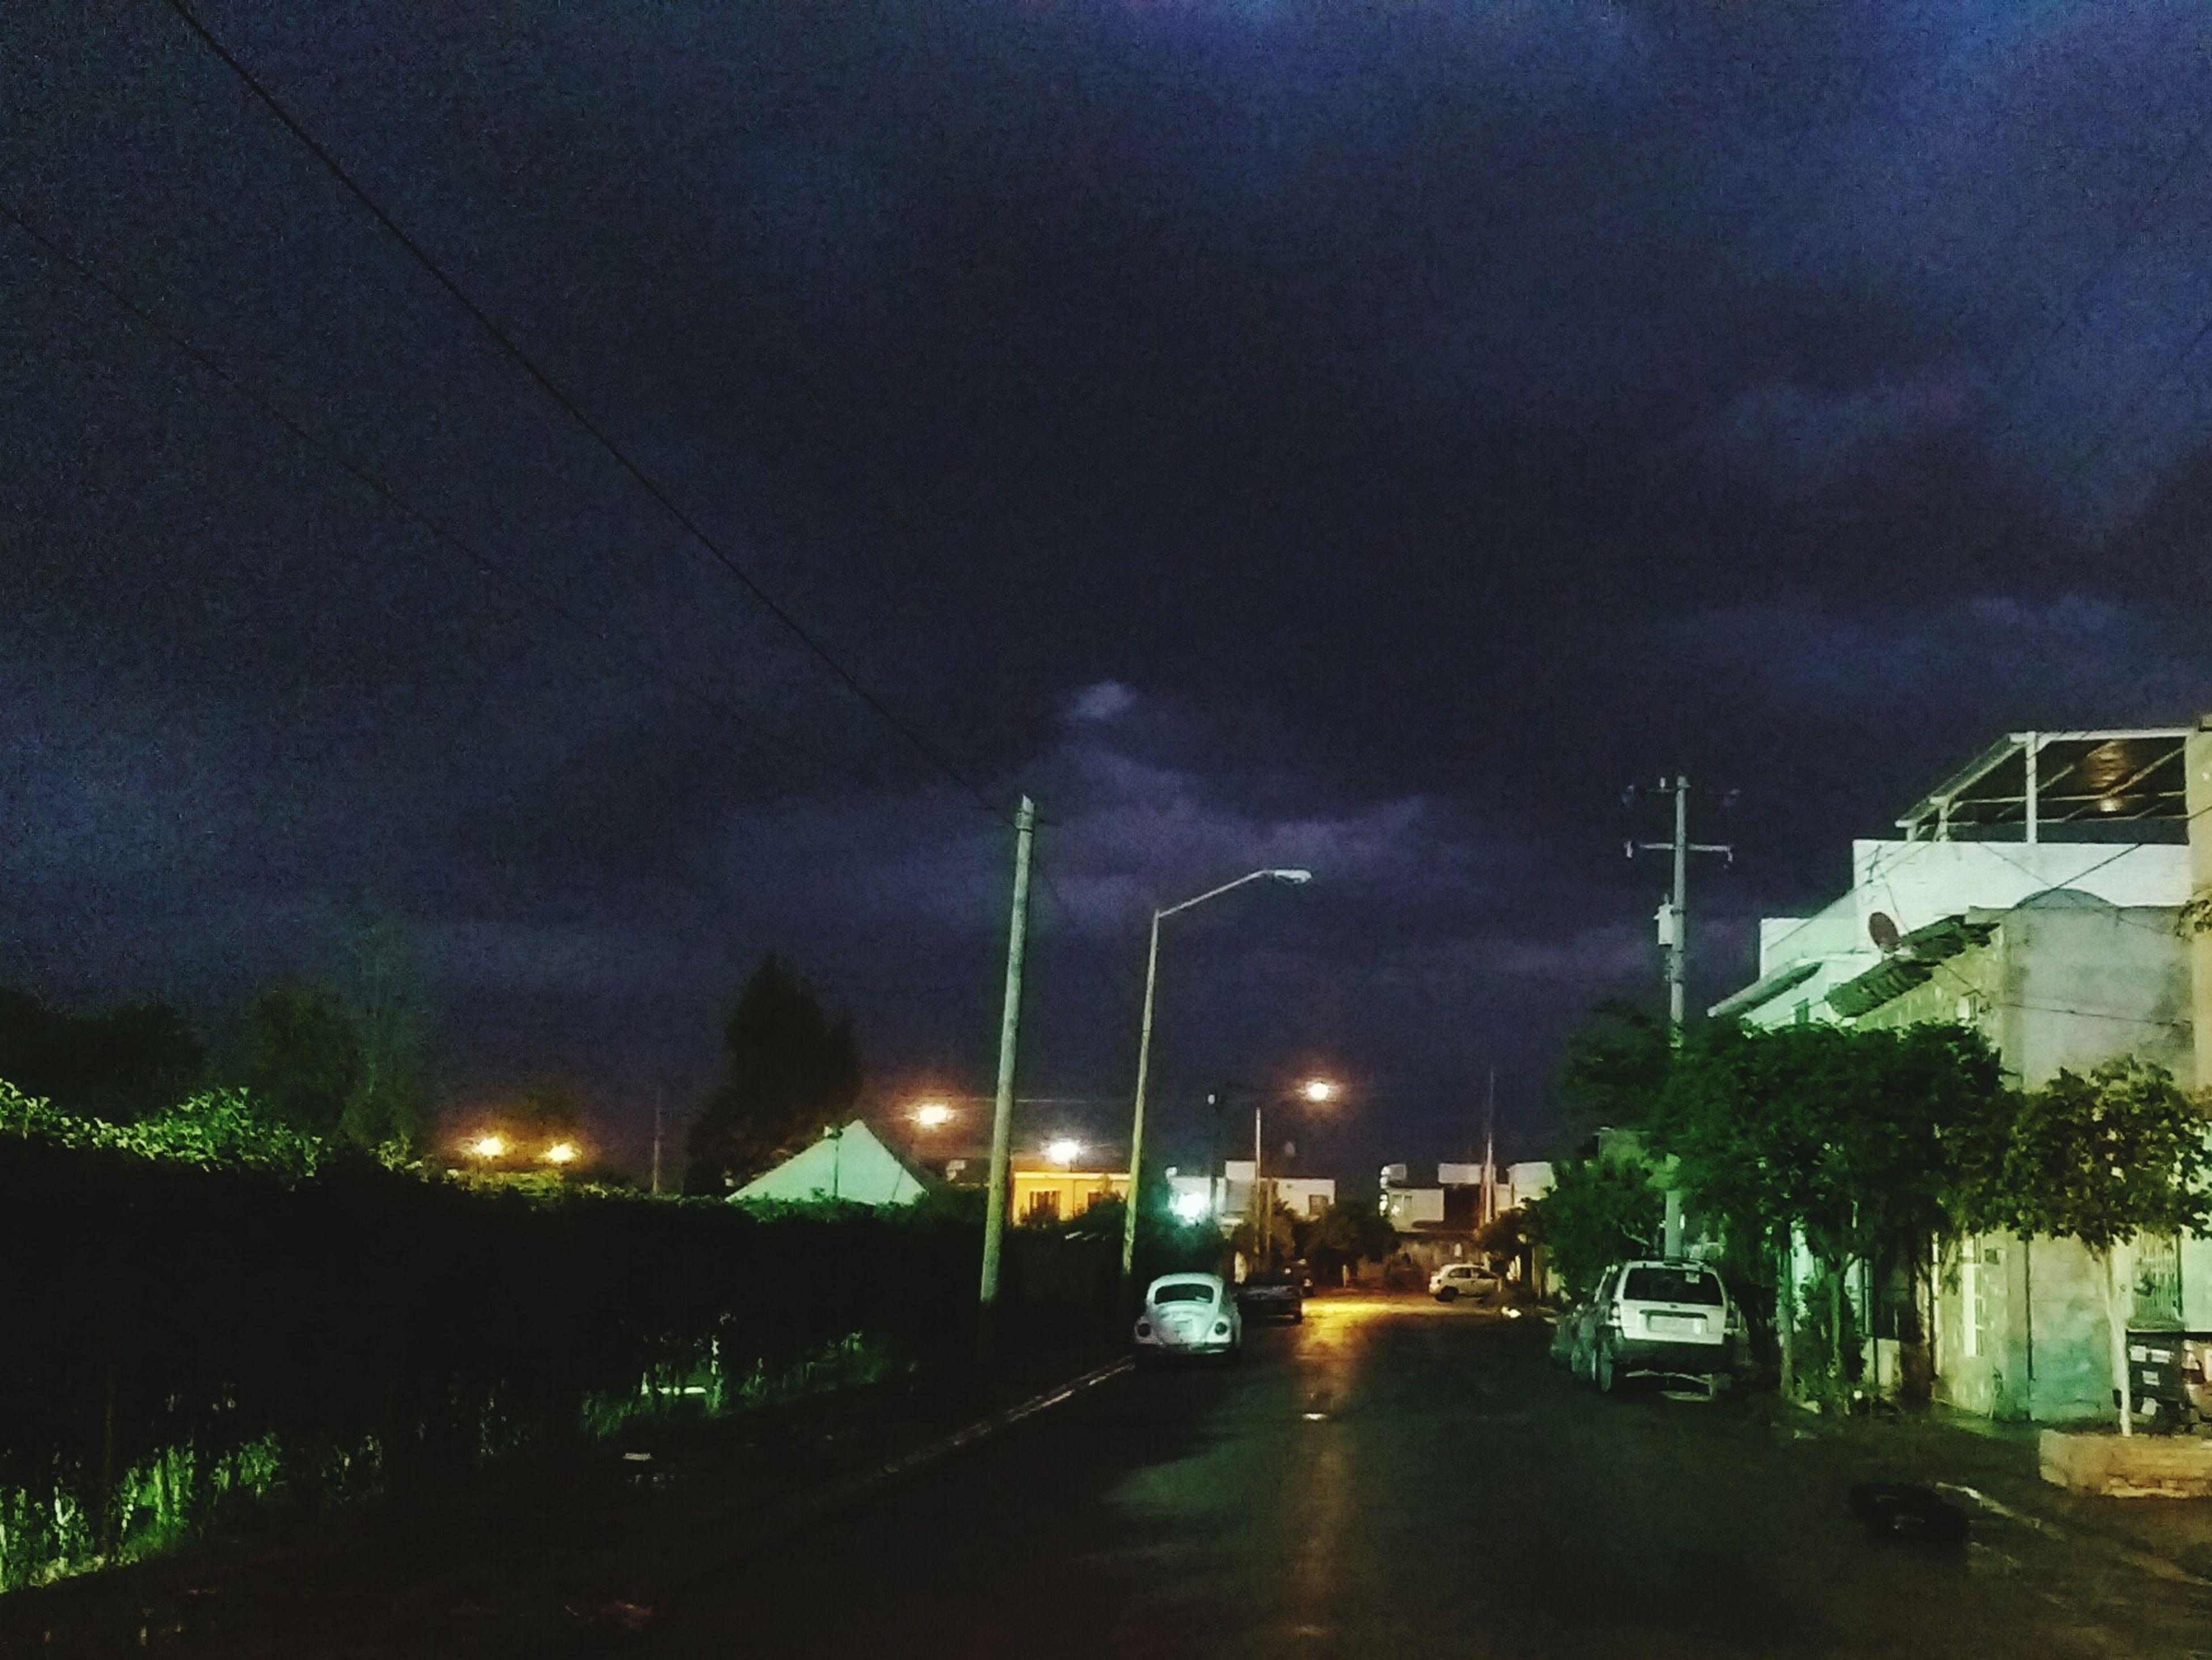 Magnifica noche!! Sky Rain Clouds Nightphotography